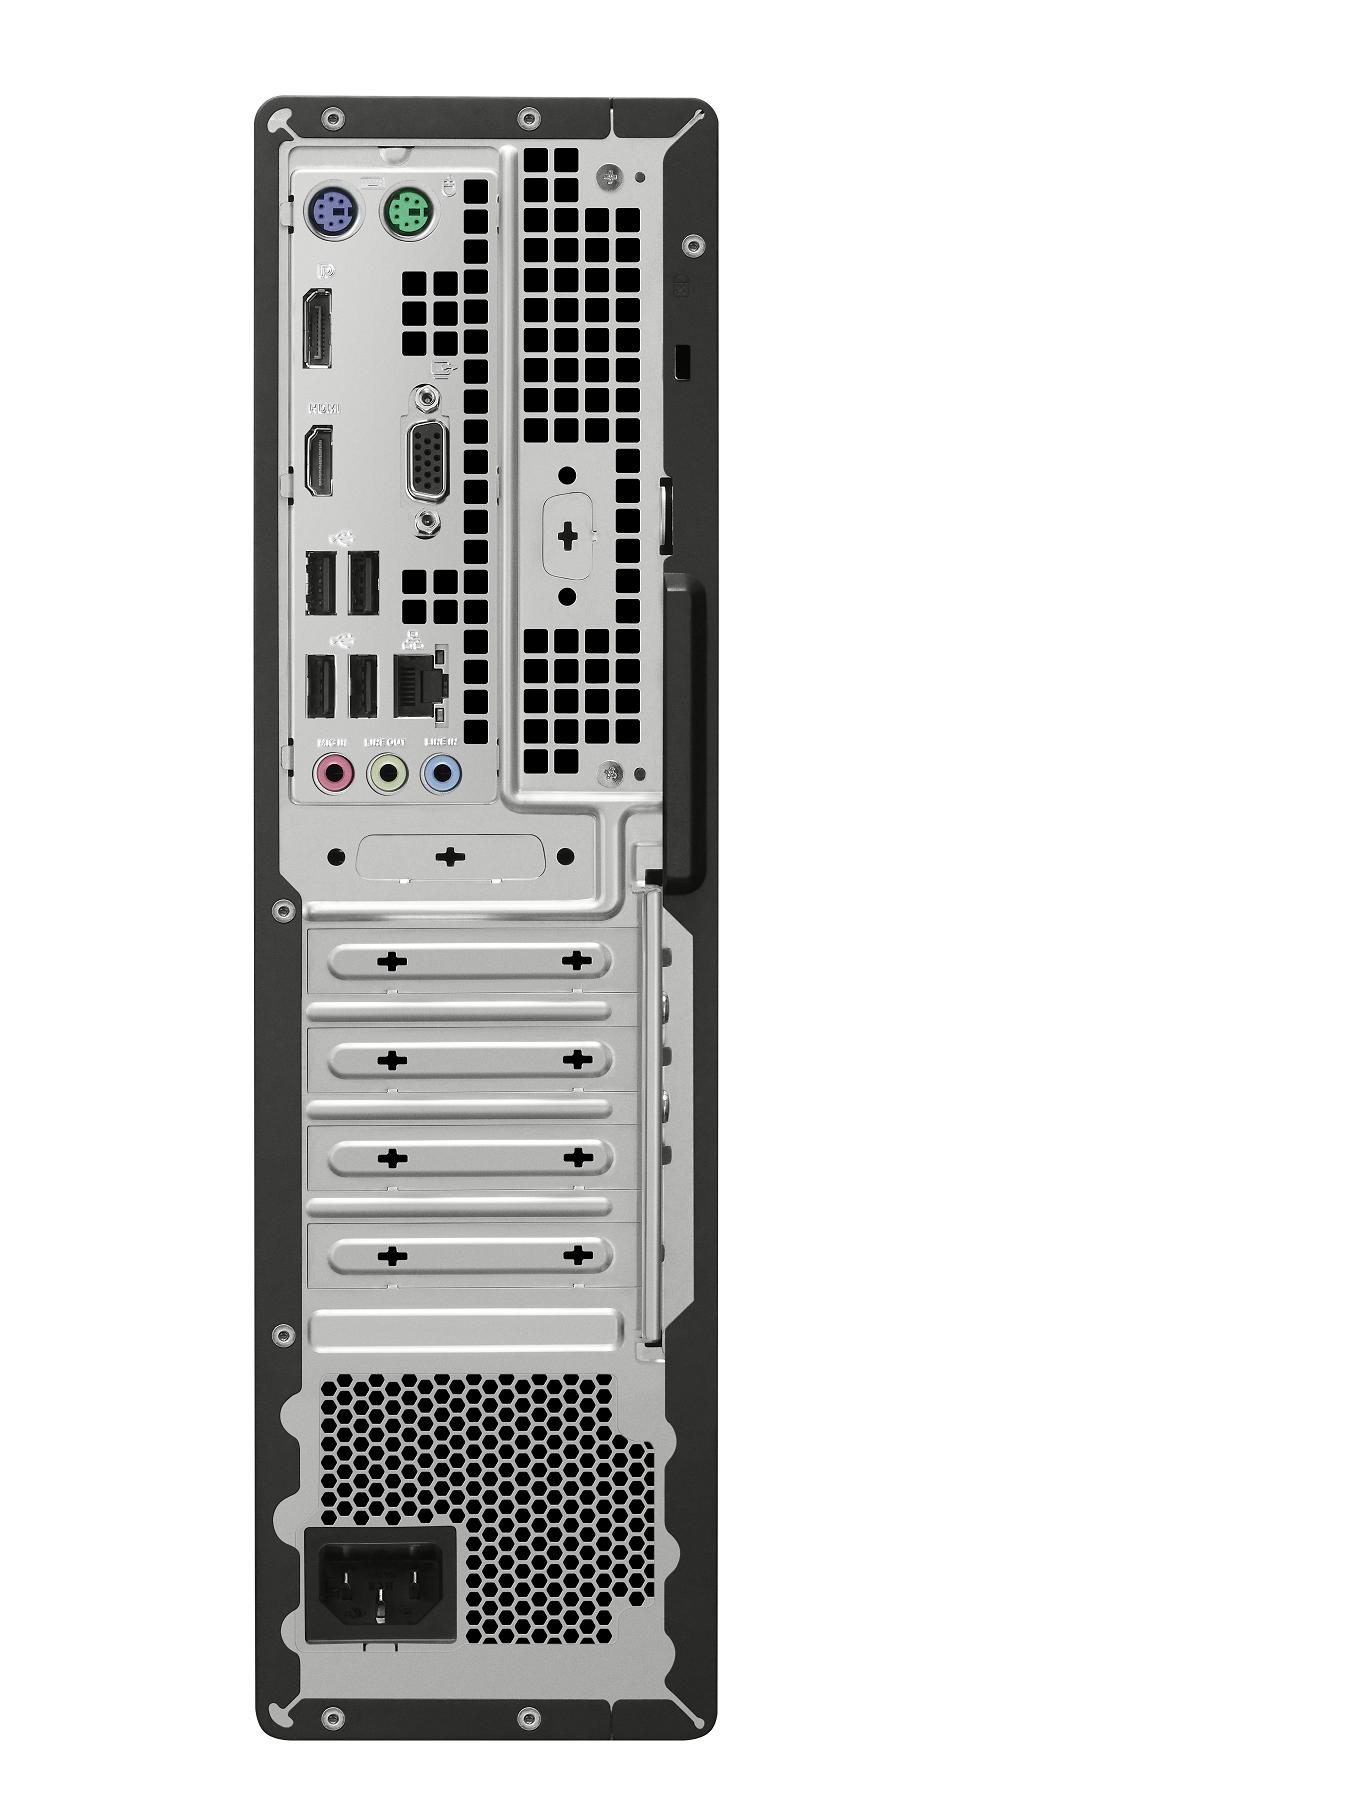 ASUS S500SA-310100069TS DESKTOP PC-BLACK (I3-10100/4GB/256GB SSD/WIN10/3YRS)+MS OFFICE 2019